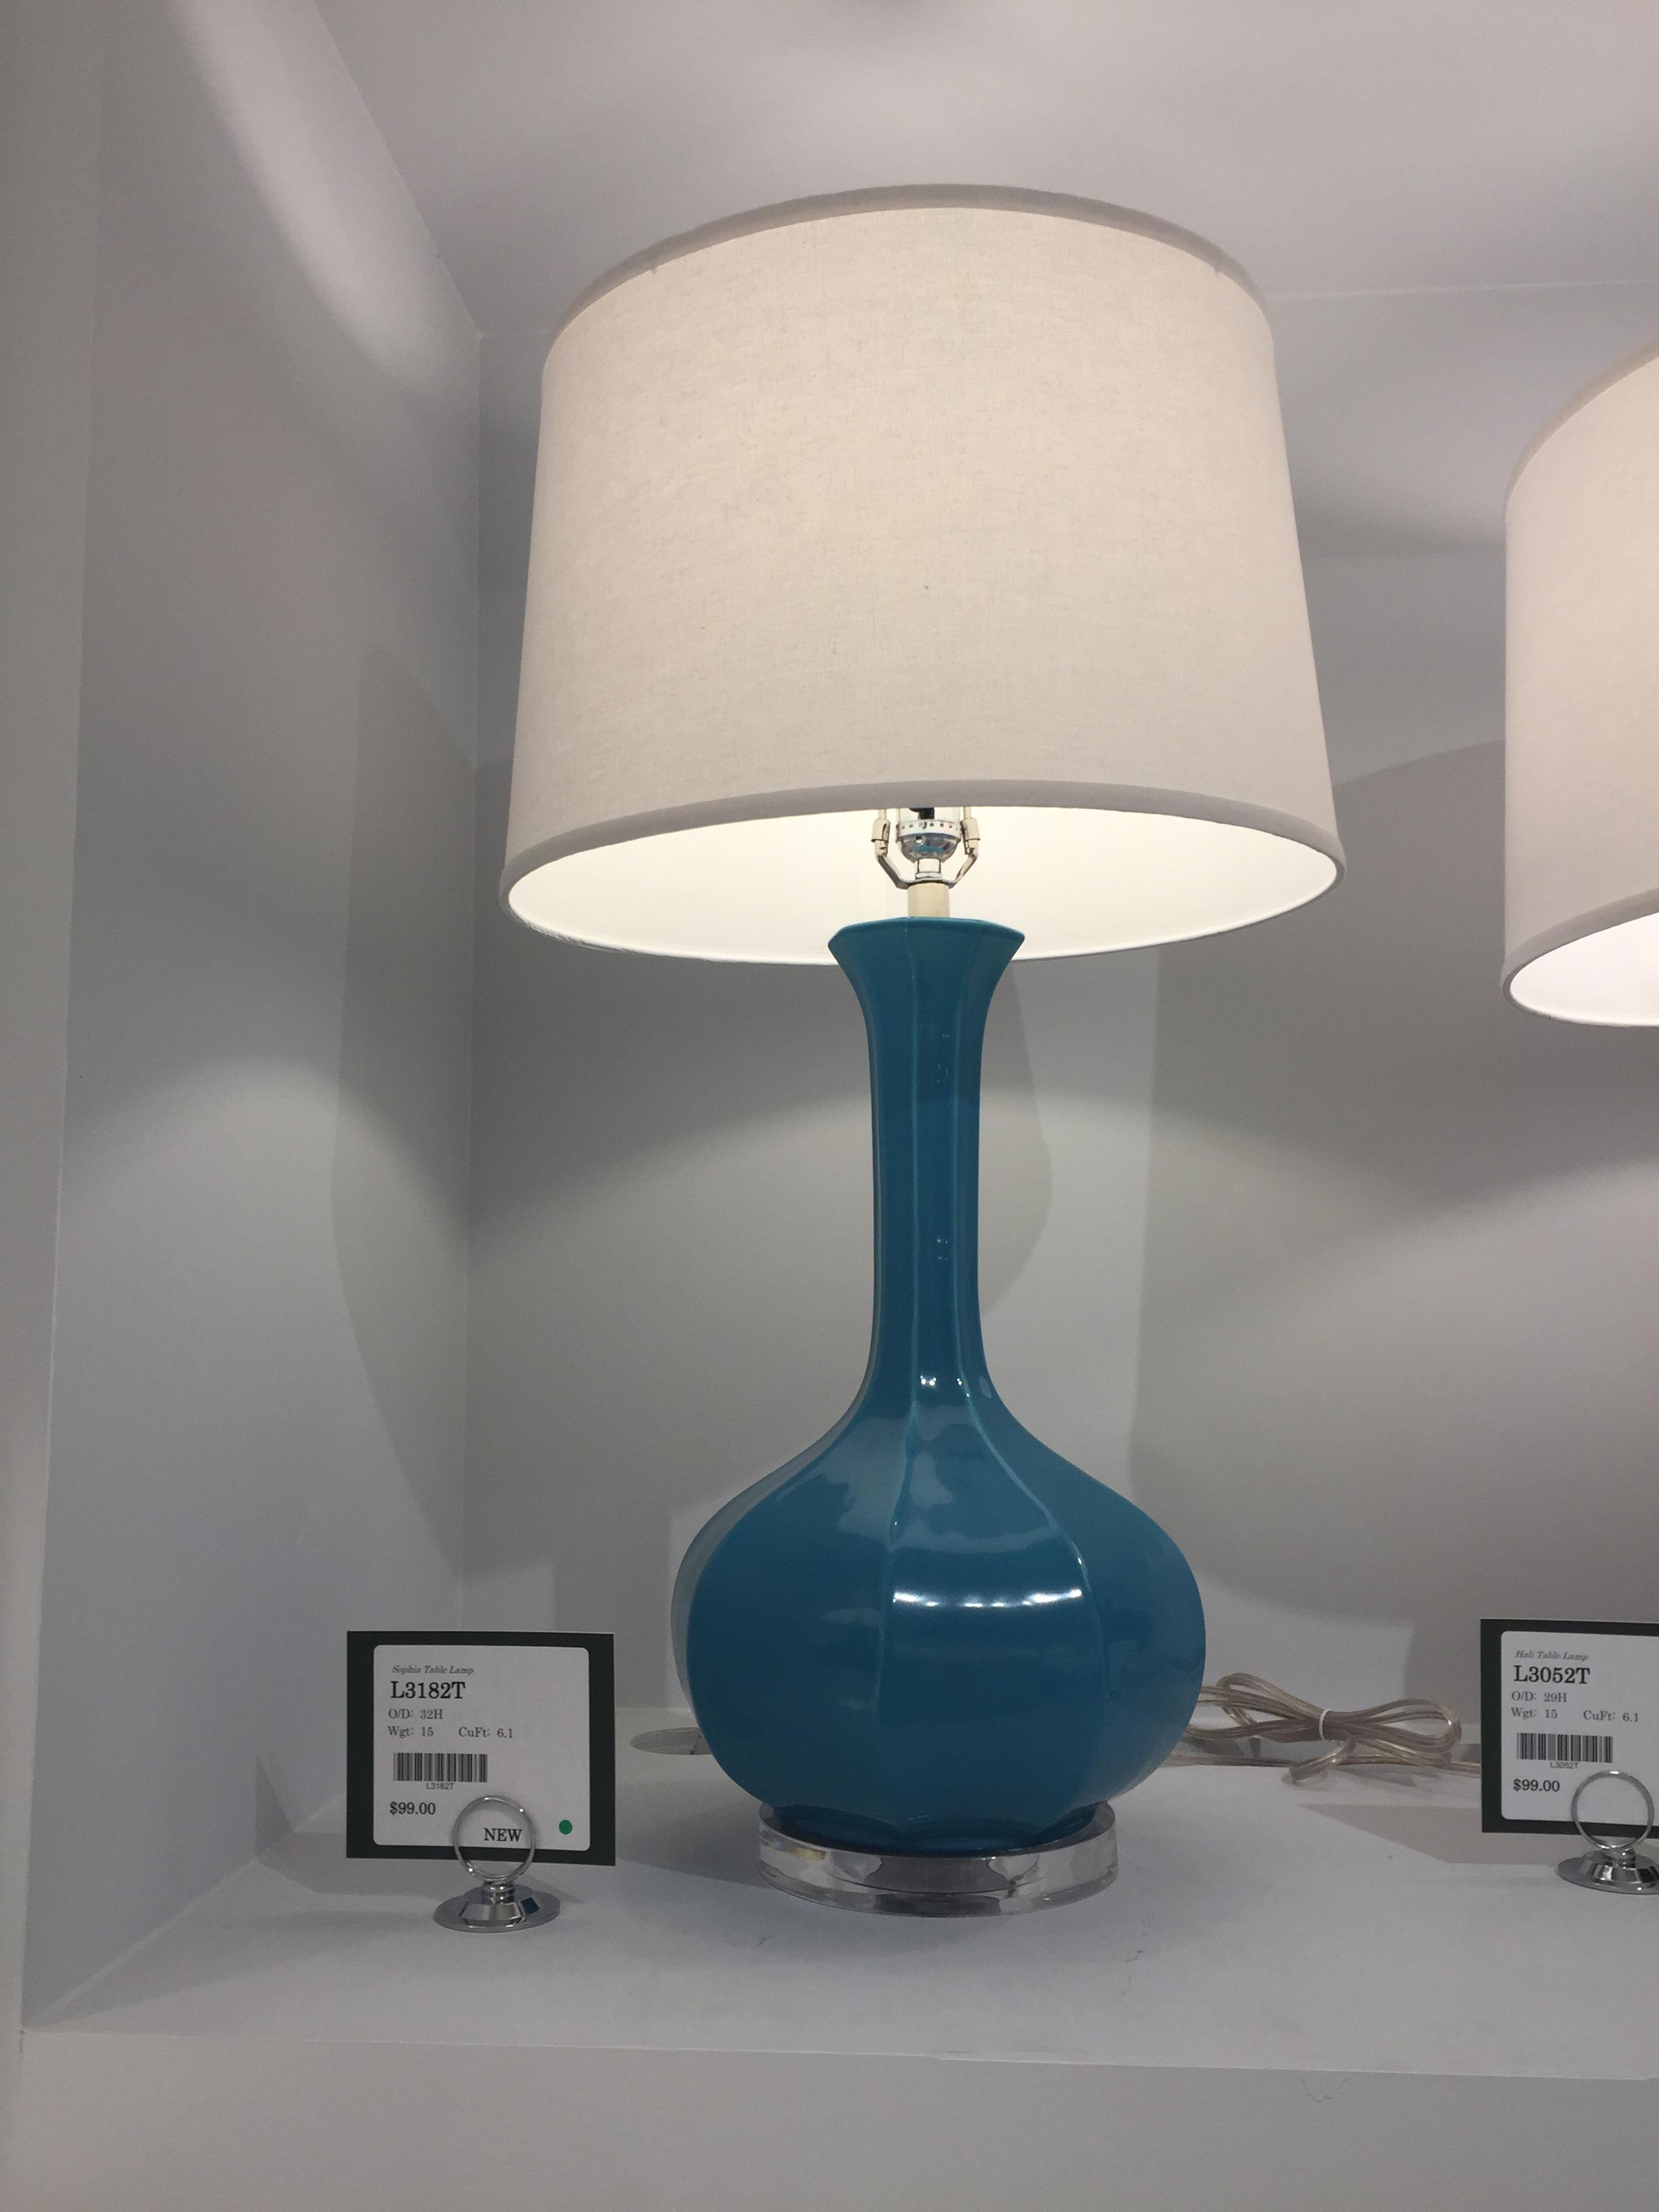 bassett mirror old world sophia table lamp jacksonville furniture mart table lamps. Black Bedroom Furniture Sets. Home Design Ideas